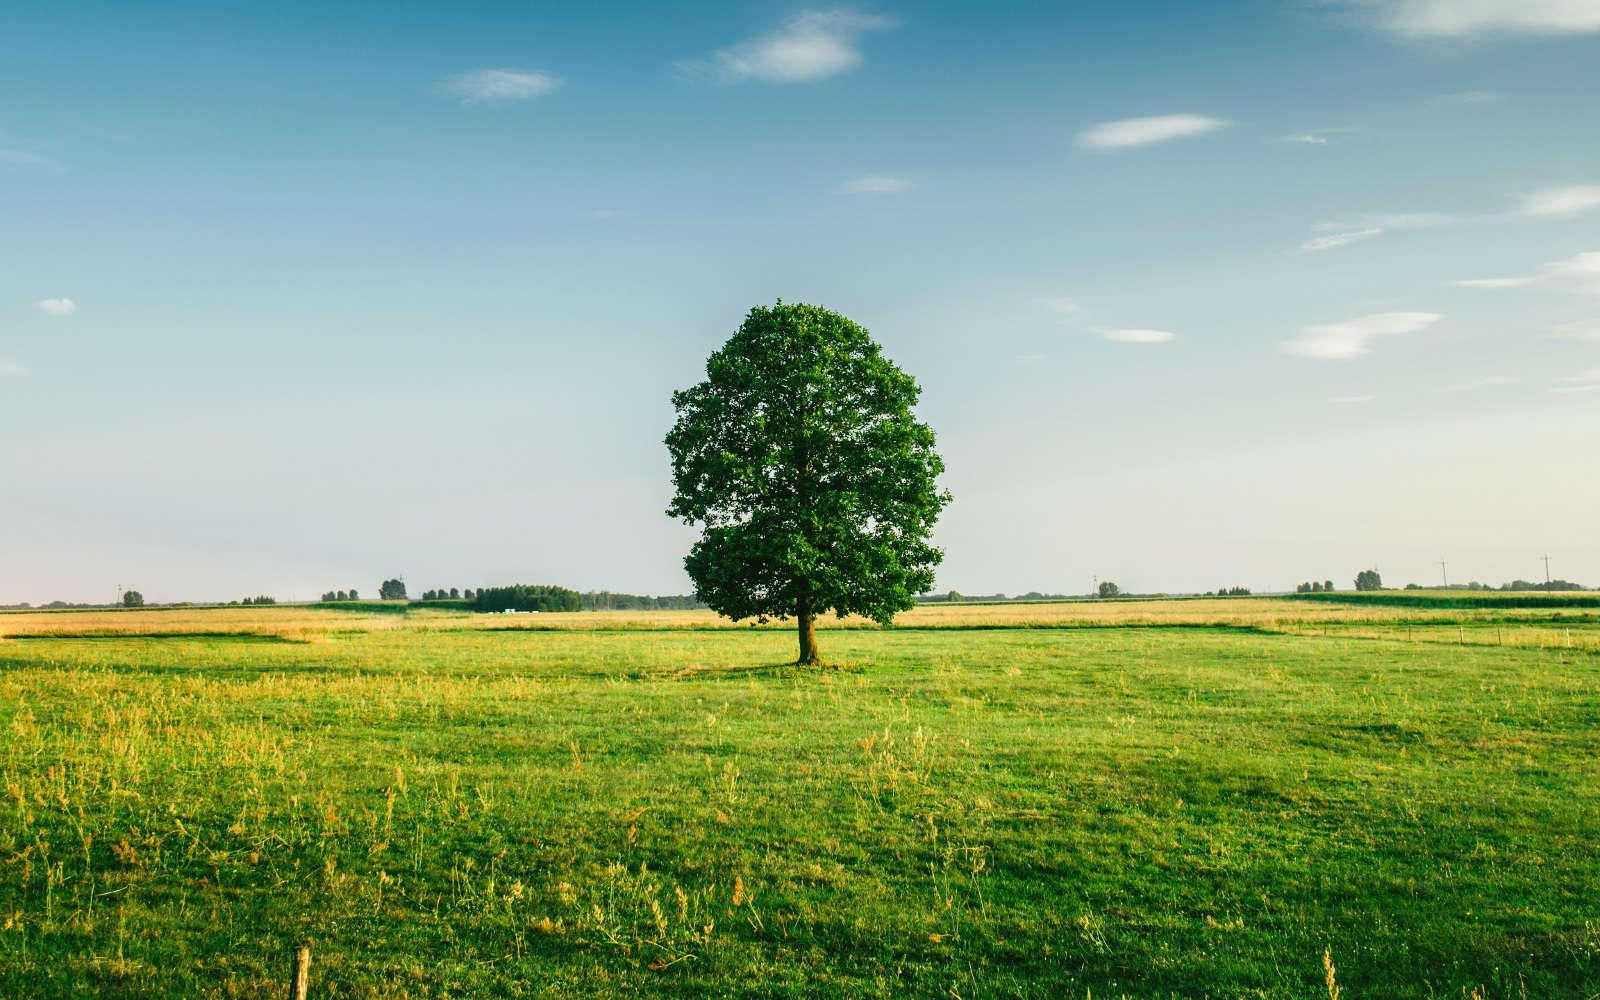 Hochbeet-Farm-Hintergrundbild-Startseite